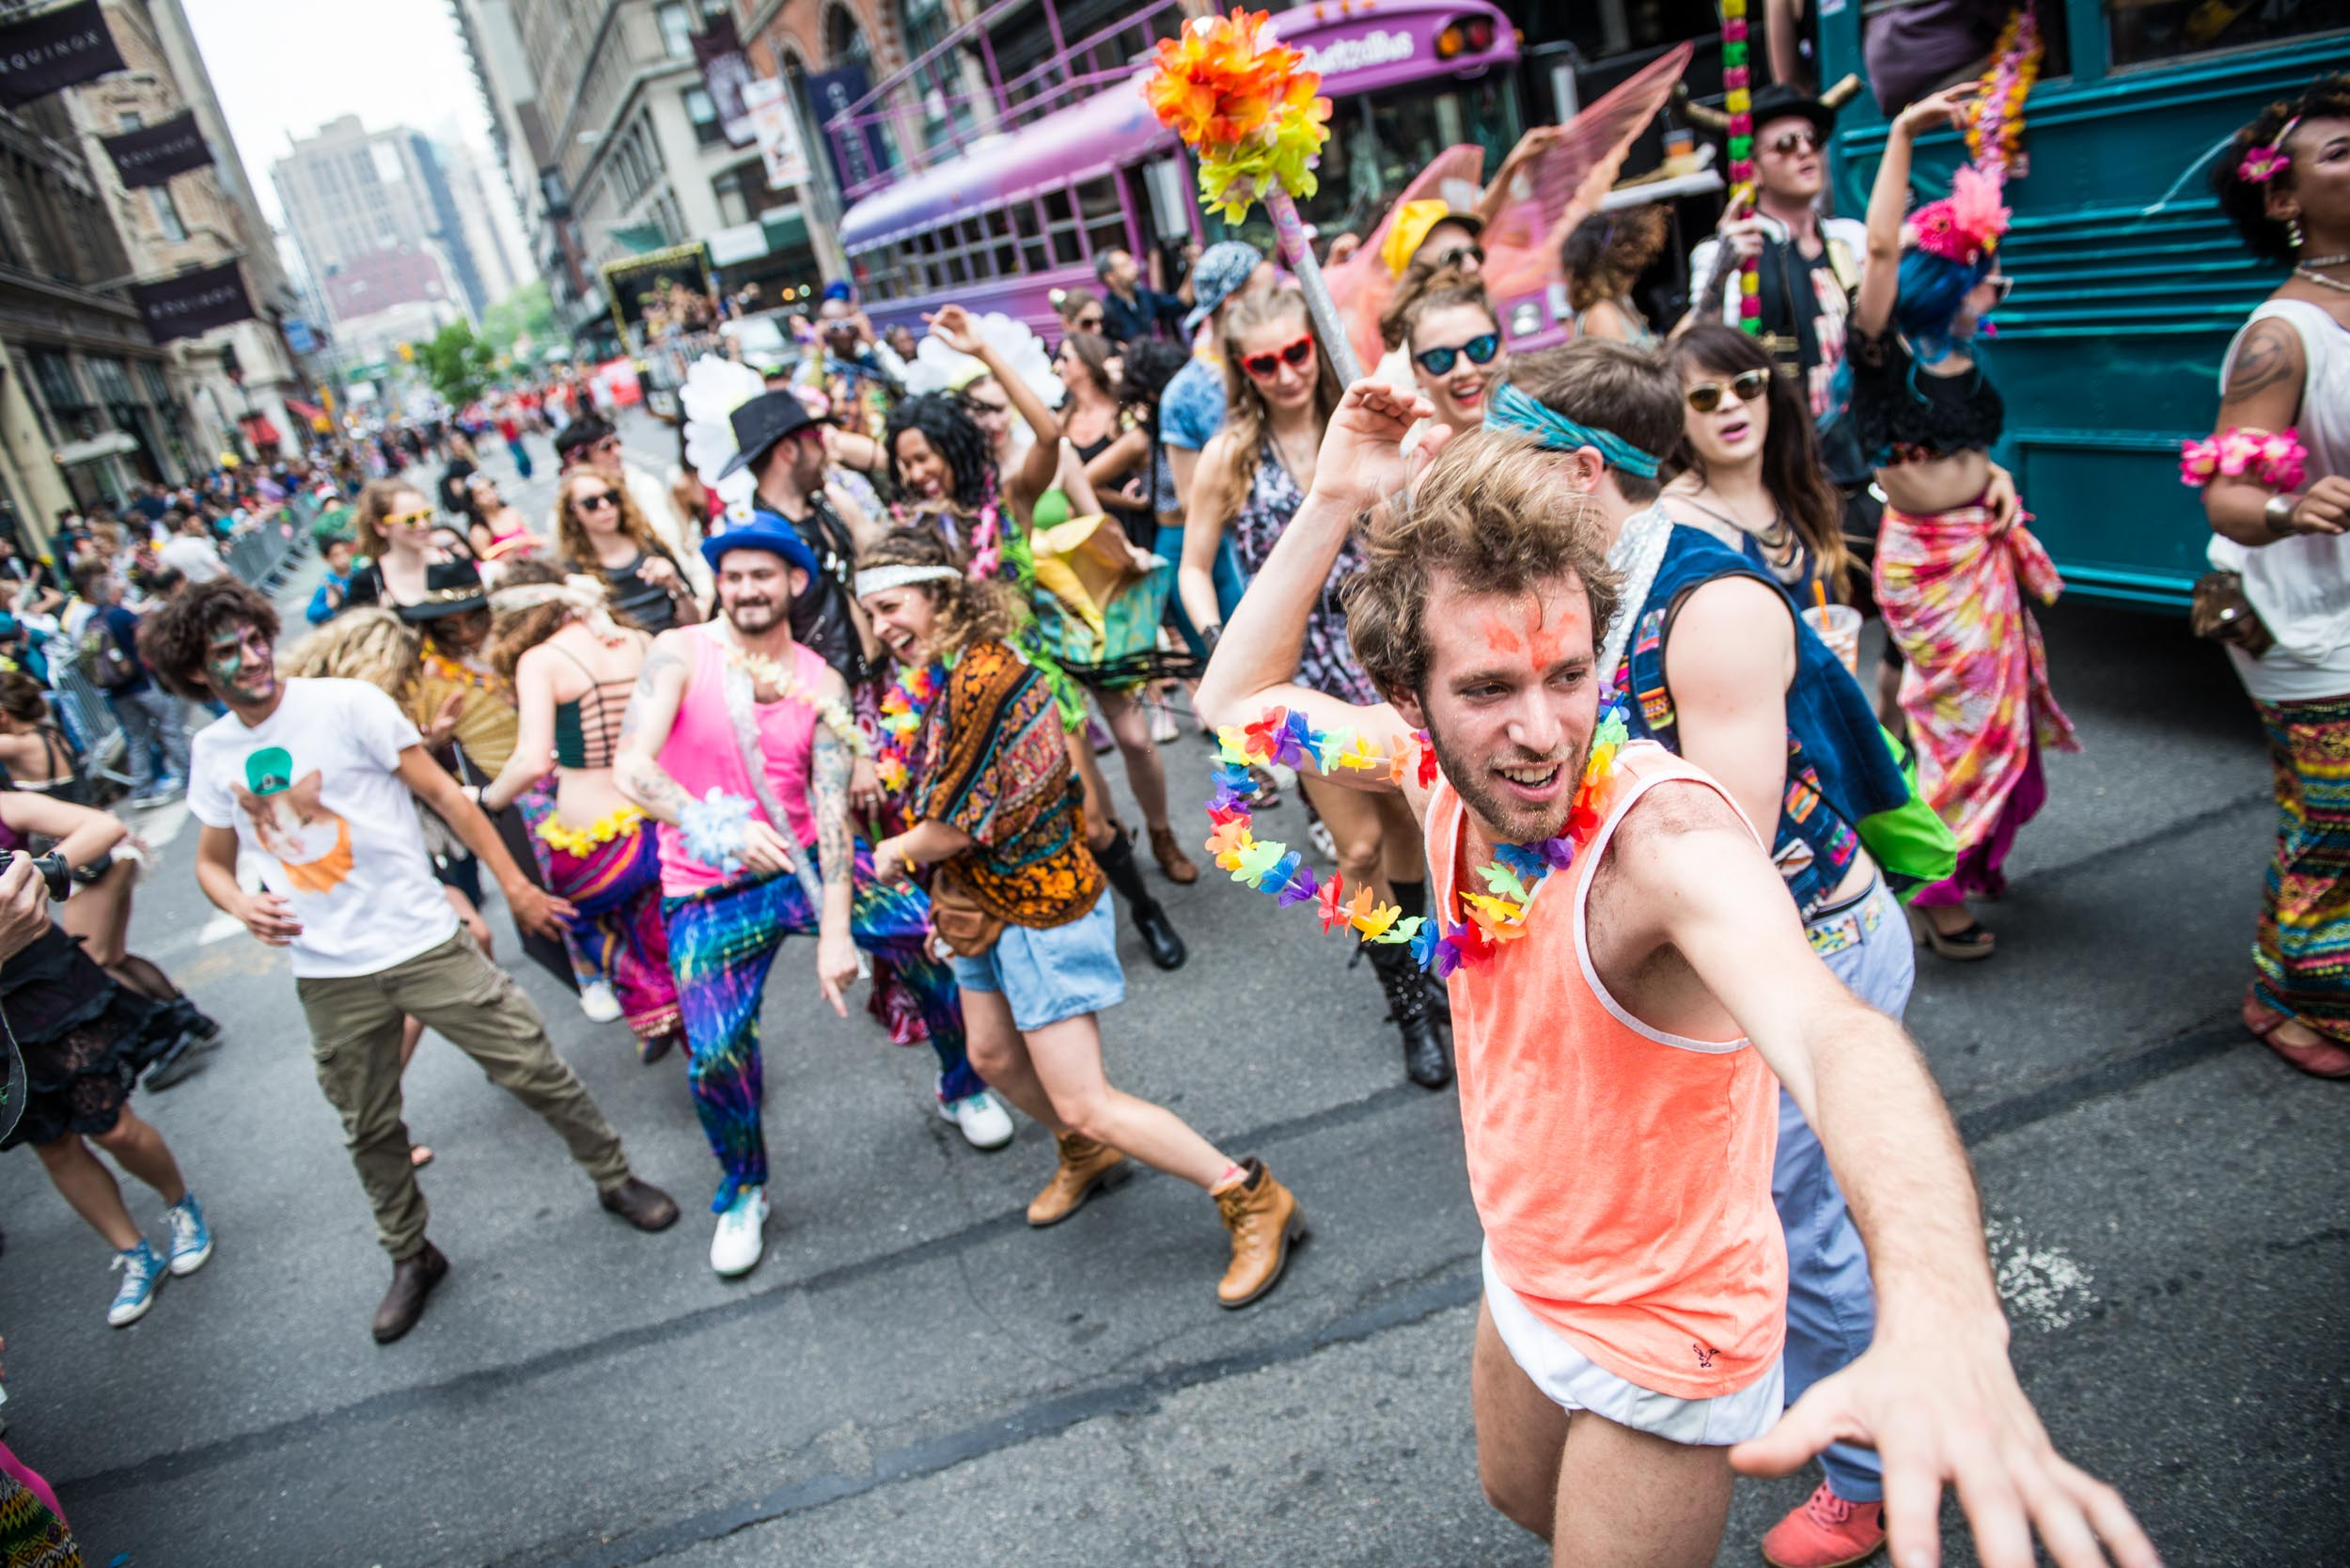 Street dance festival - Current events - Photo credit Nicola Bailey.jpg